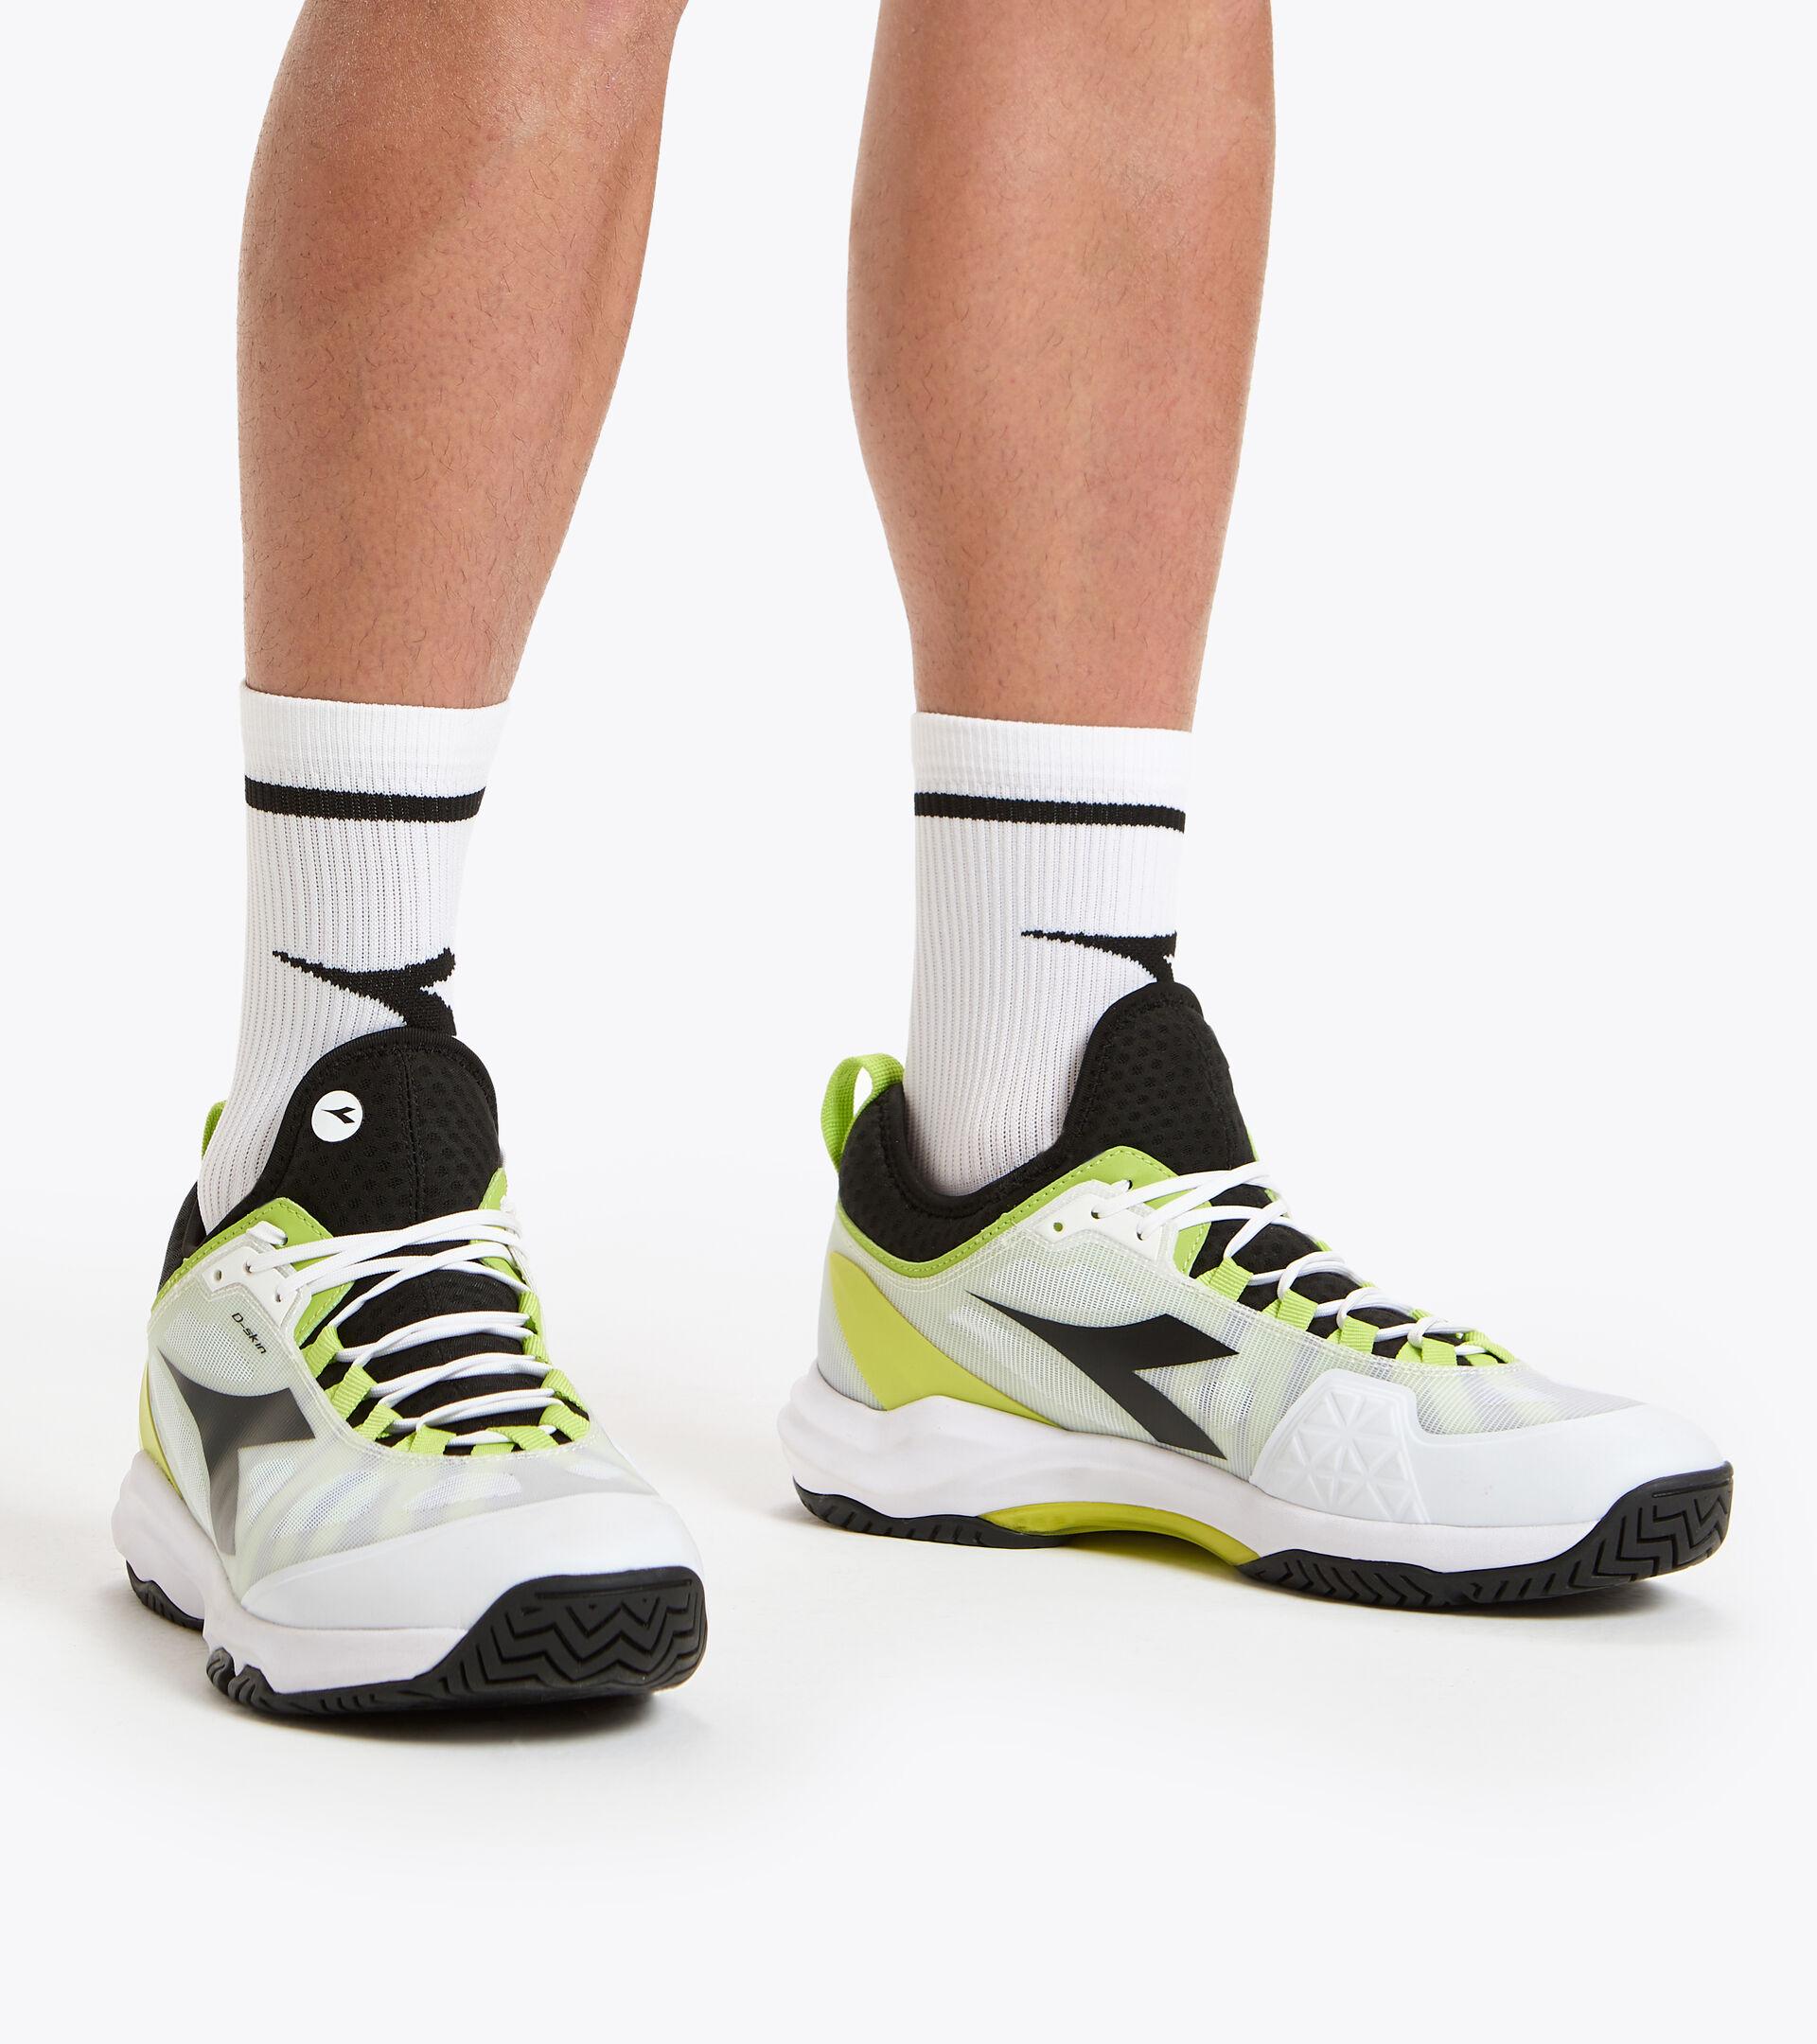 Footwear Sport UOMO SPEED BLUSHIELD FLY 3 + AG WHITE/BLACK/LIME GREEN Diadora